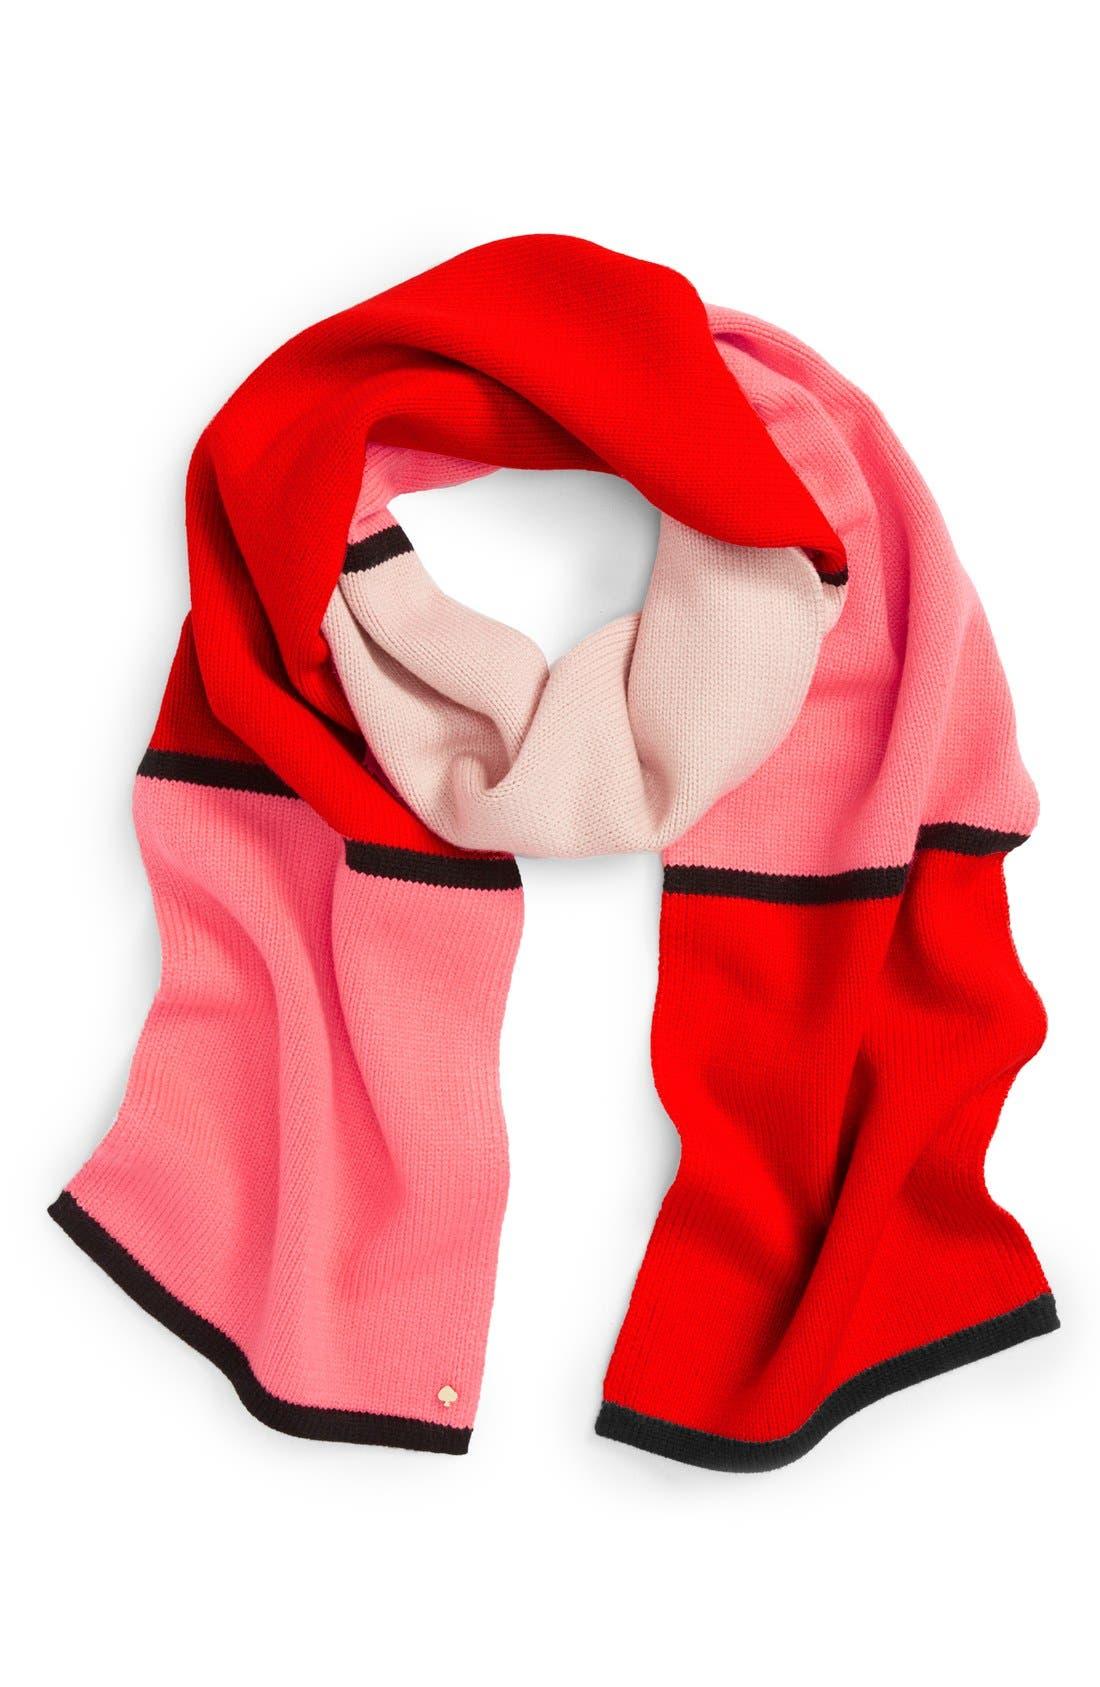 Main Image - kate spade new york mondarian colorblock scarf